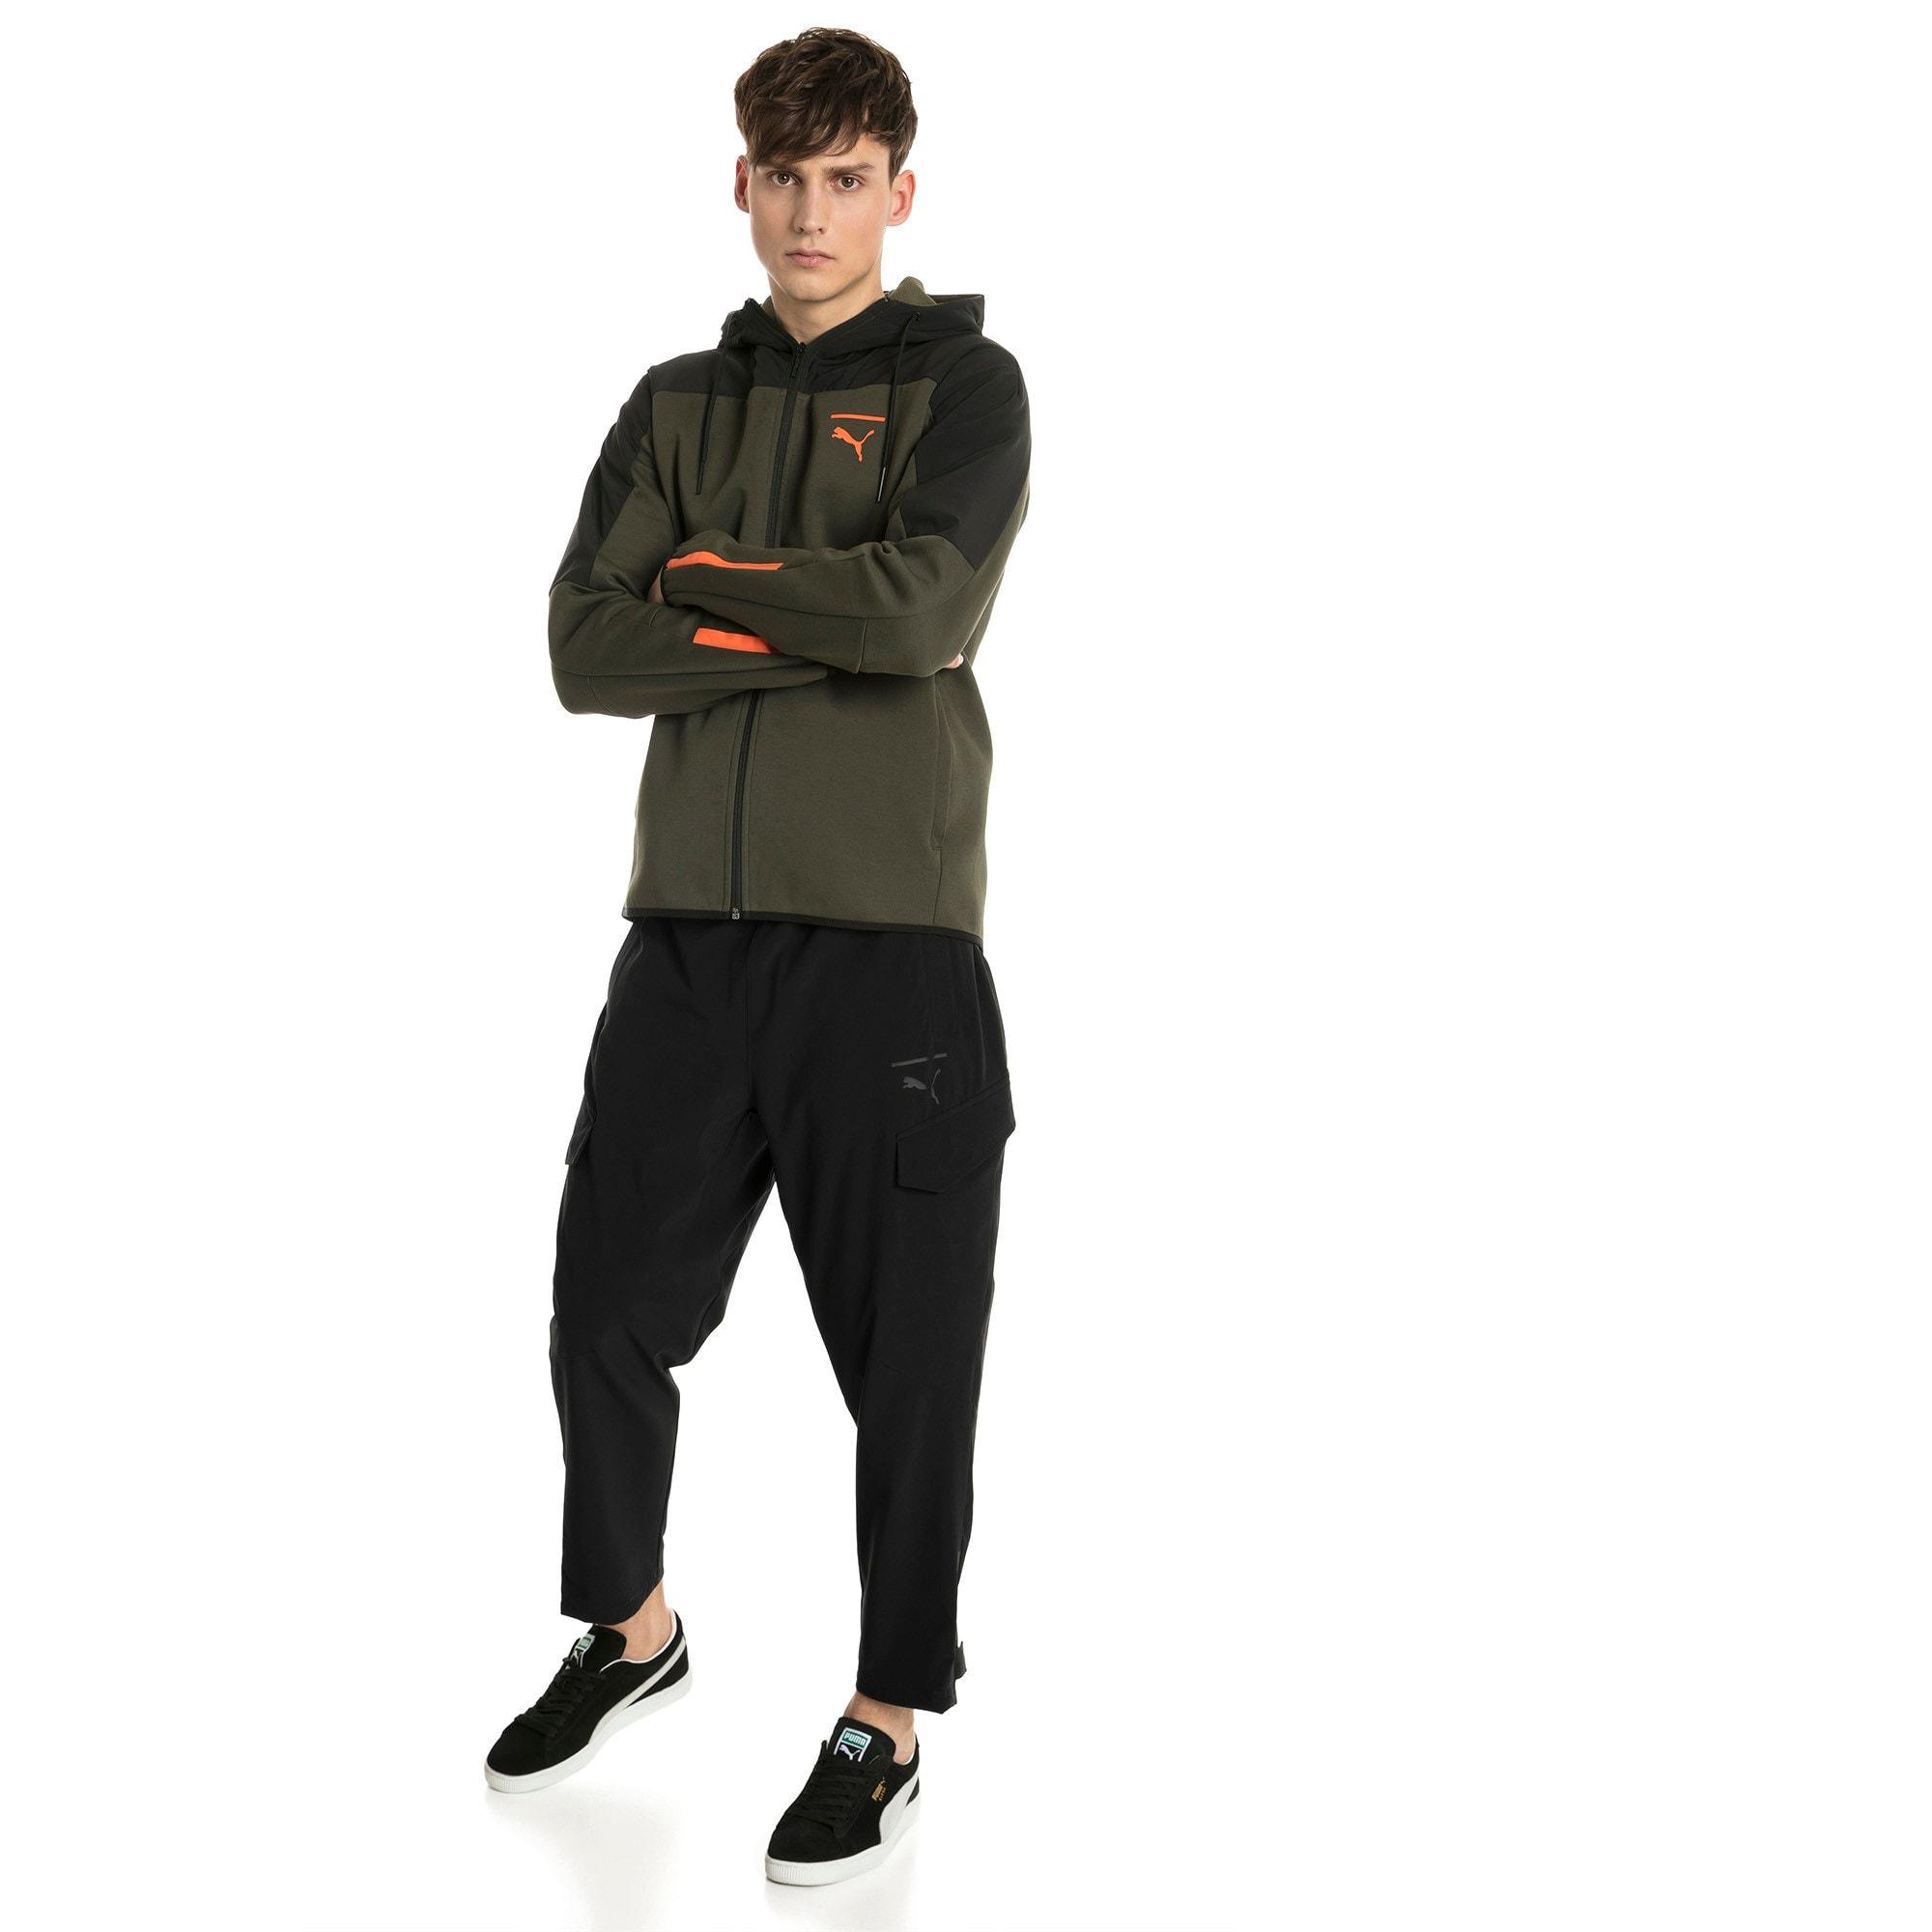 Thumbnail 3 of Pace Men's Sweatpants, Puma Black-1, medium-IND